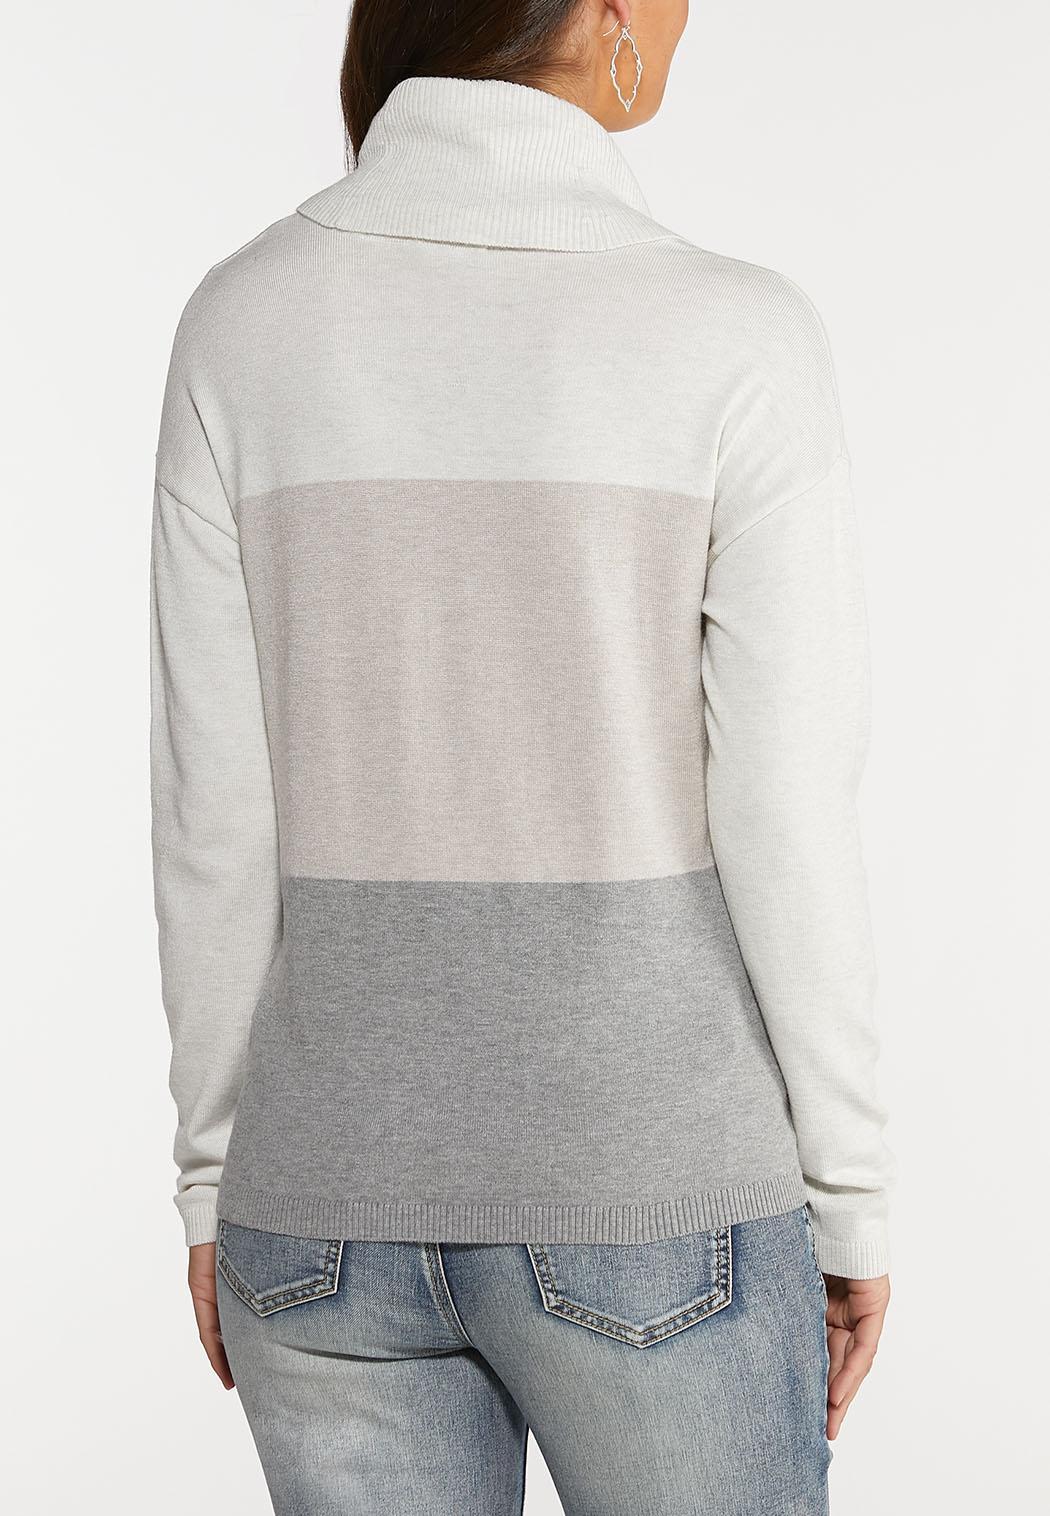 Plus Size Colorblock Cowl Neck Sweater (Item #43990904)